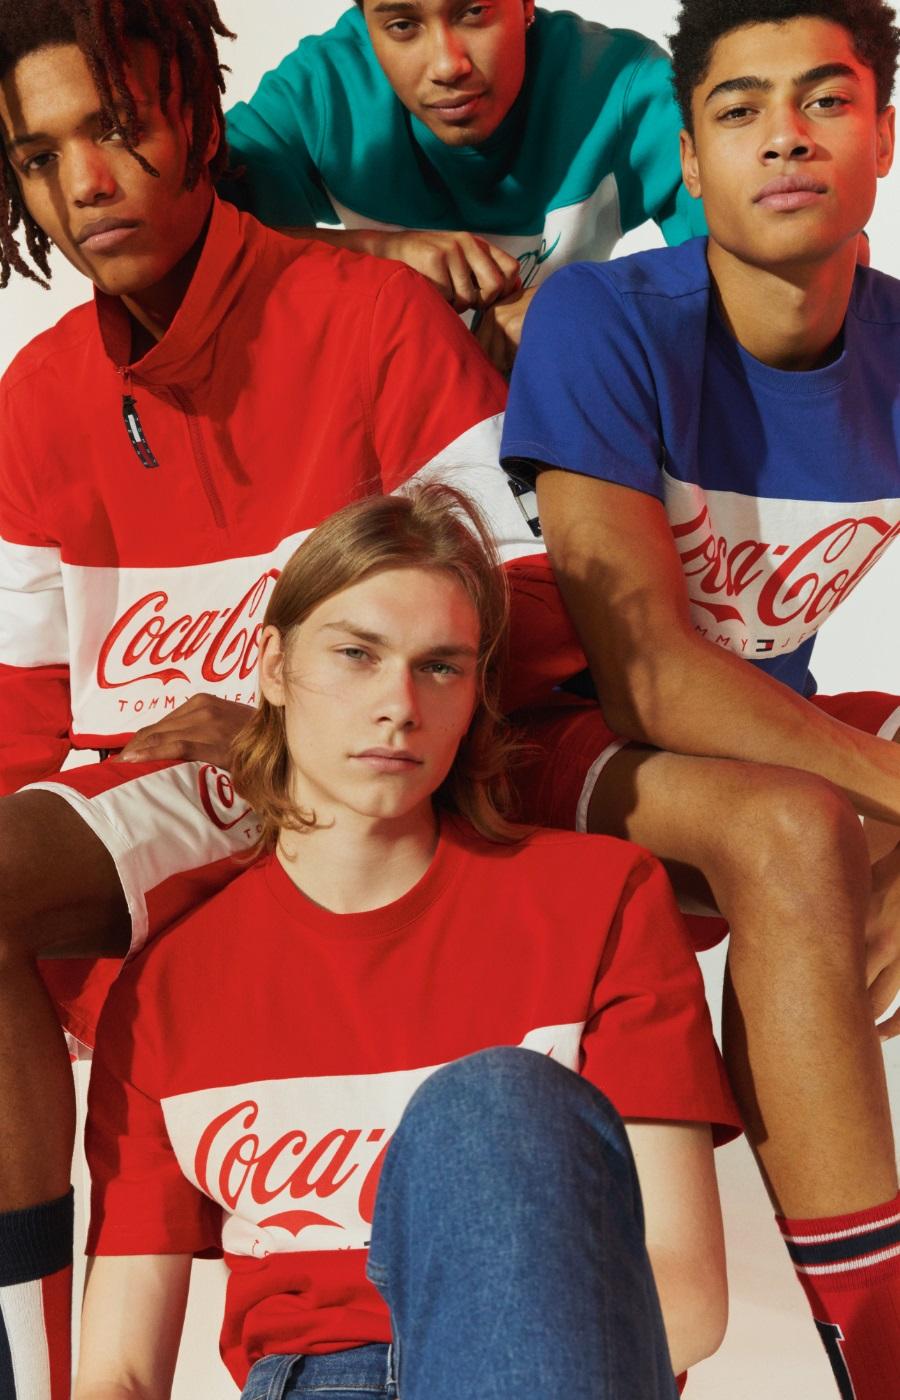 tommy-hilfiger-coca-cola-17-2